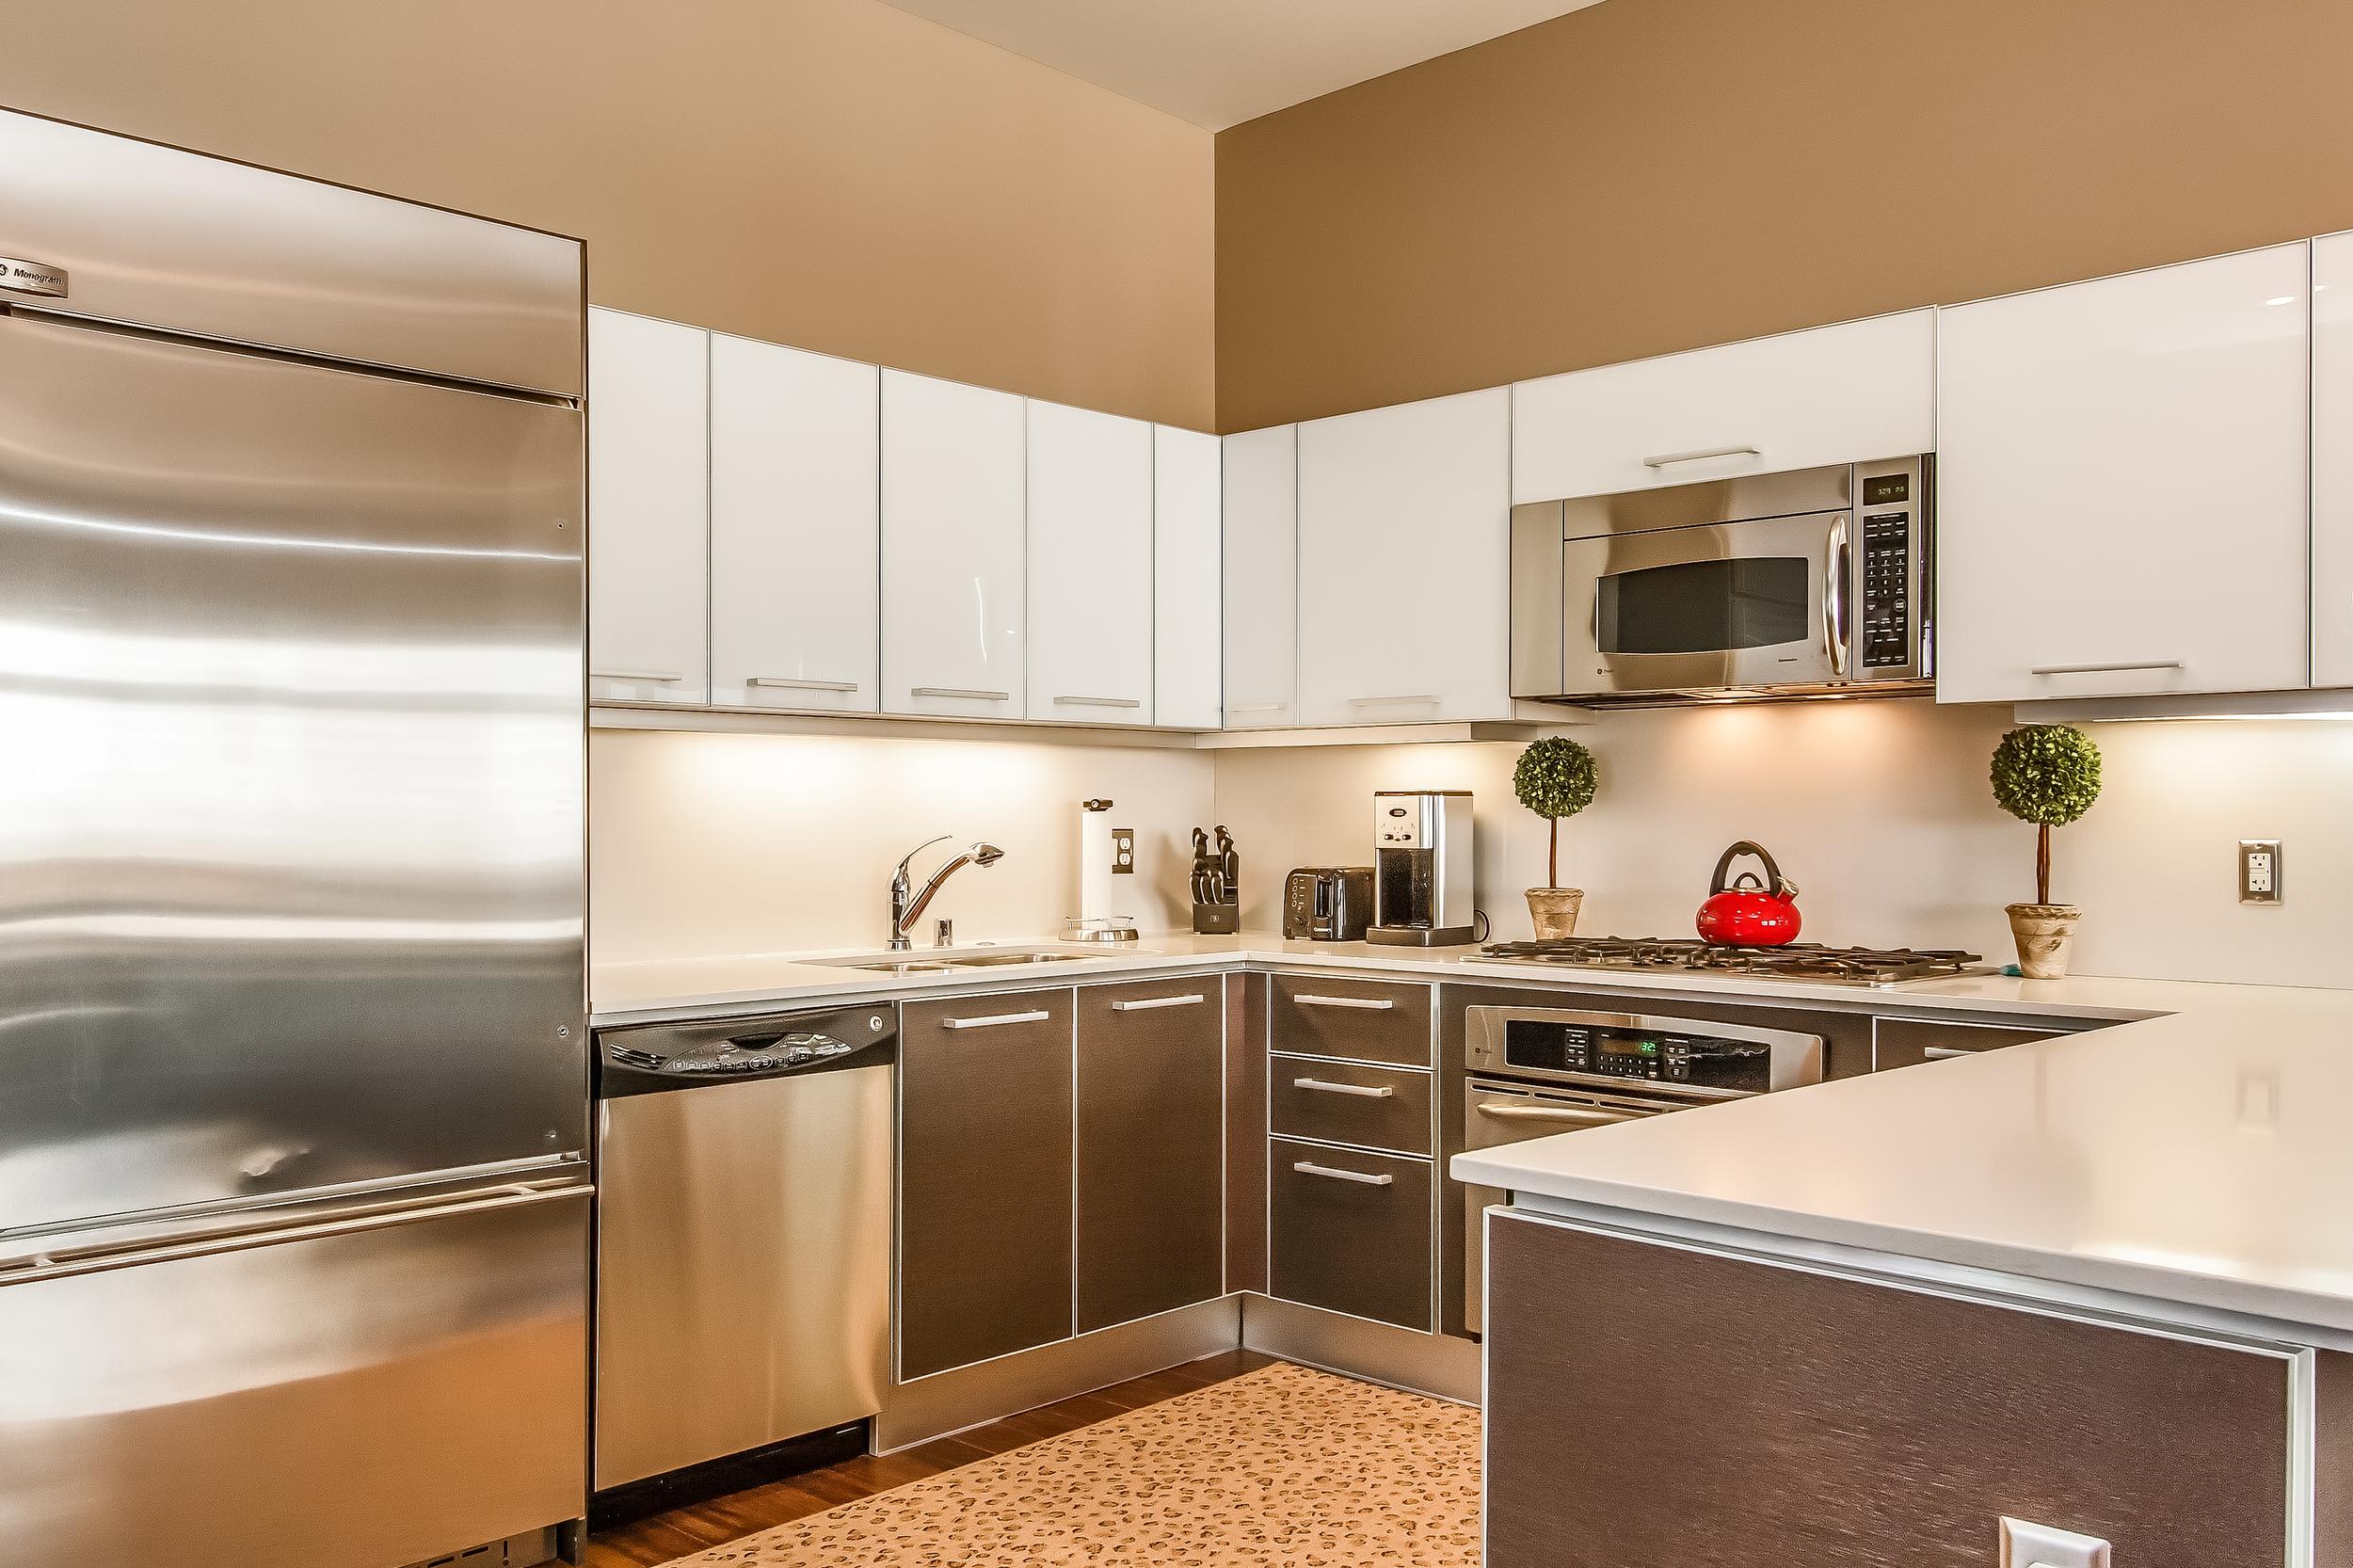 000-Kitchen-513545-large.jpg